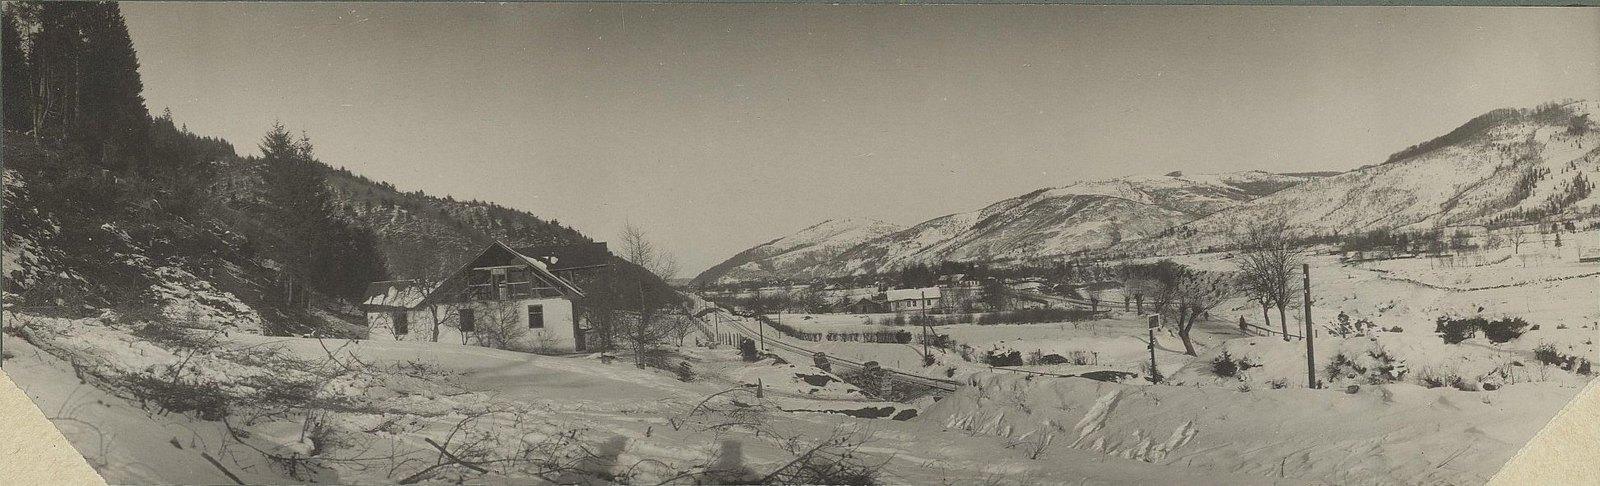 1915. Село Дора